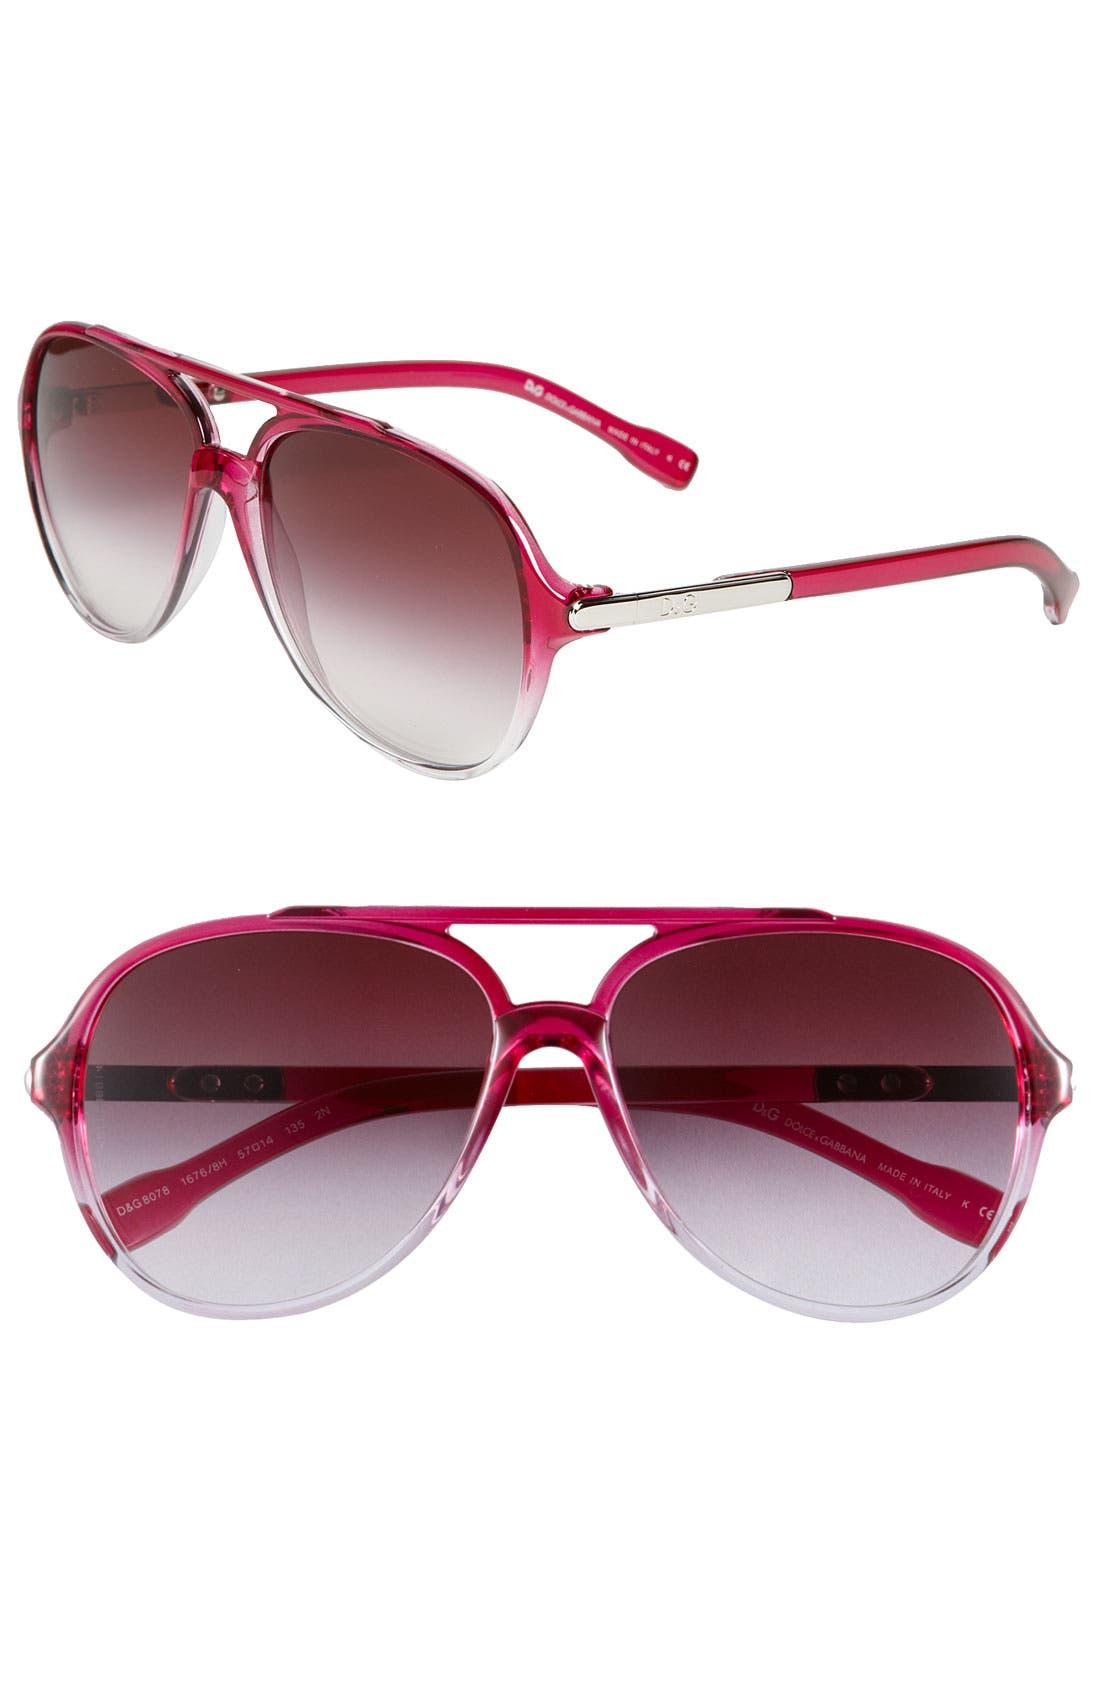 Alternate Image 1 Selected - D&G 'Trend' Aviator Sunglasses